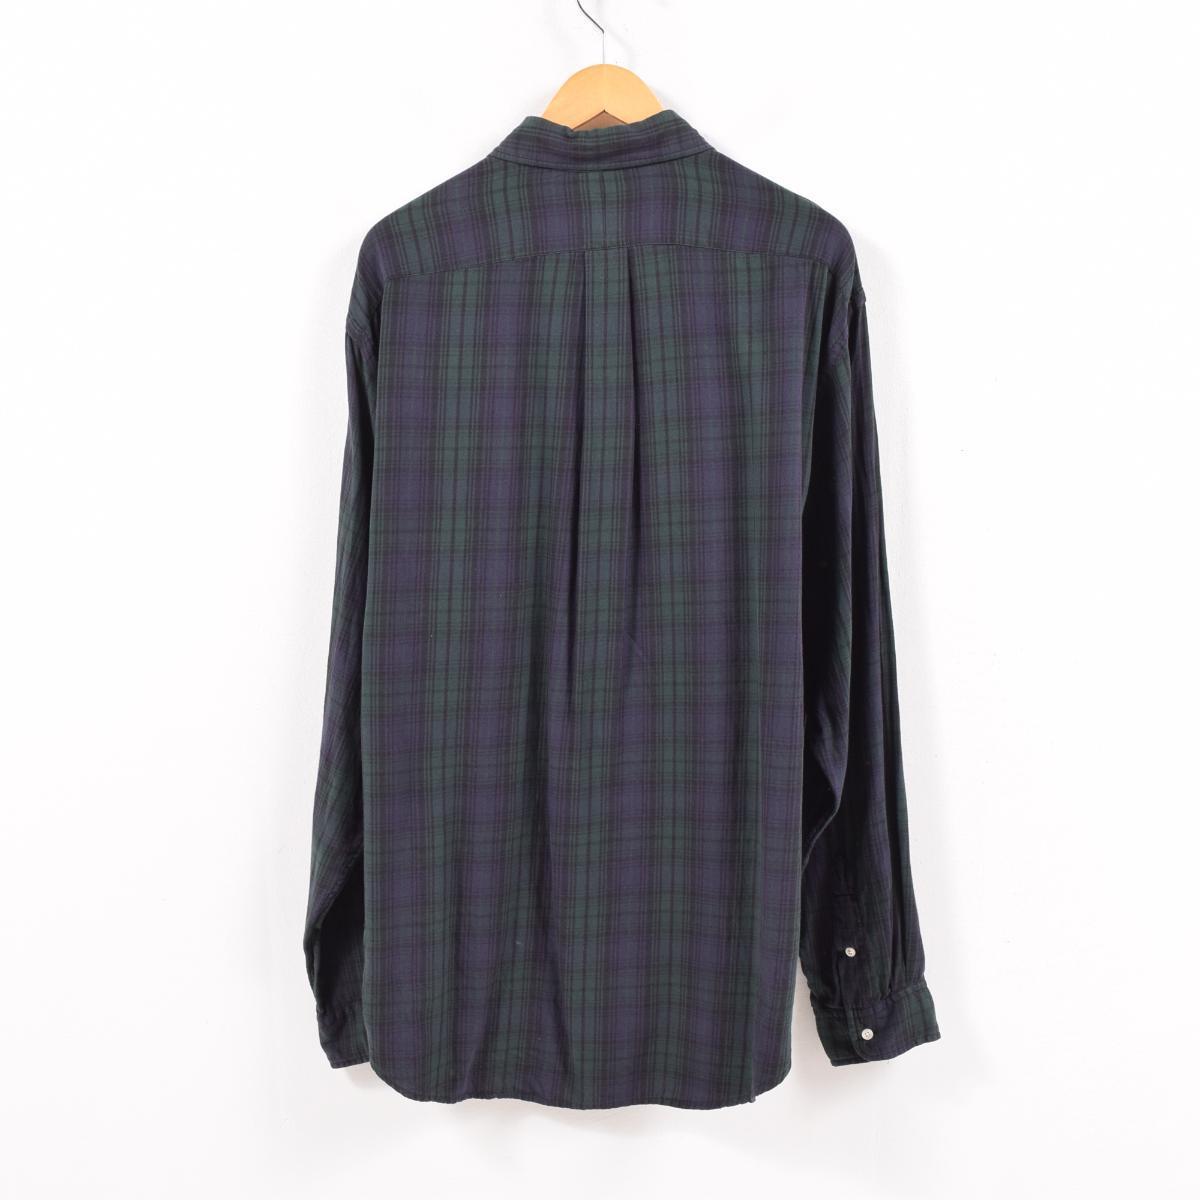 62e01445 90s Ralph Lauren Ralph Lauren RALPH LAUREN JEANS CO Black Watch check long  sleeves button-down shirt men XL /wbd9525